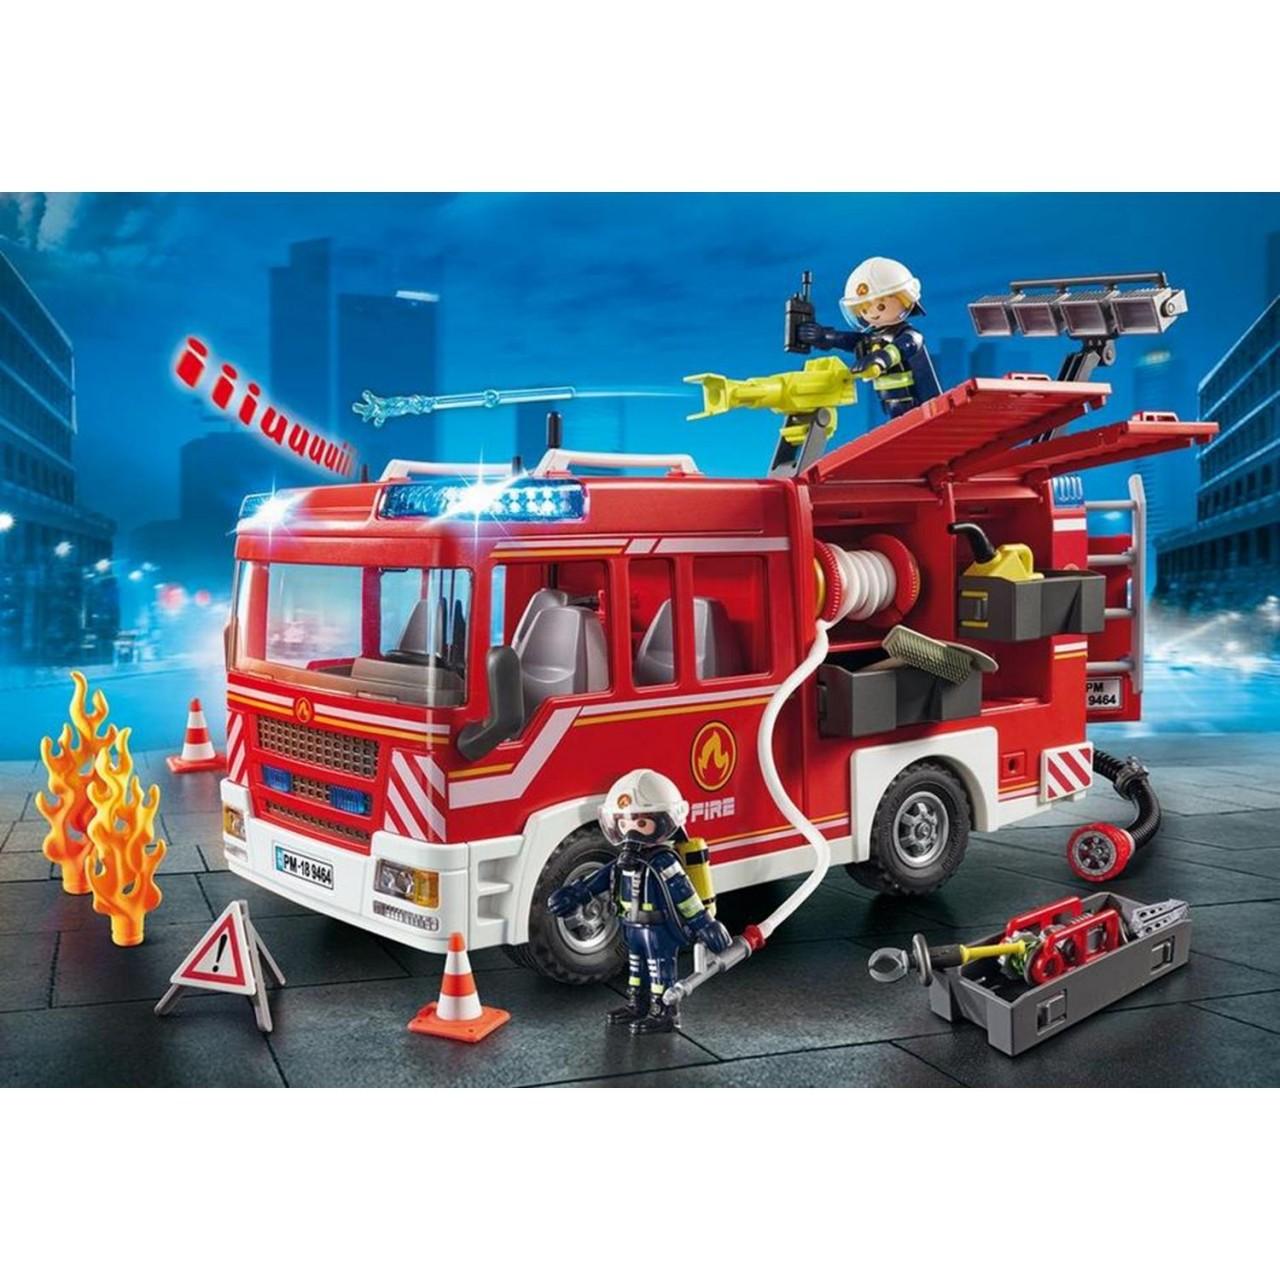 Playmobil 9464 Feuerwehr-Rüstfahrzeug